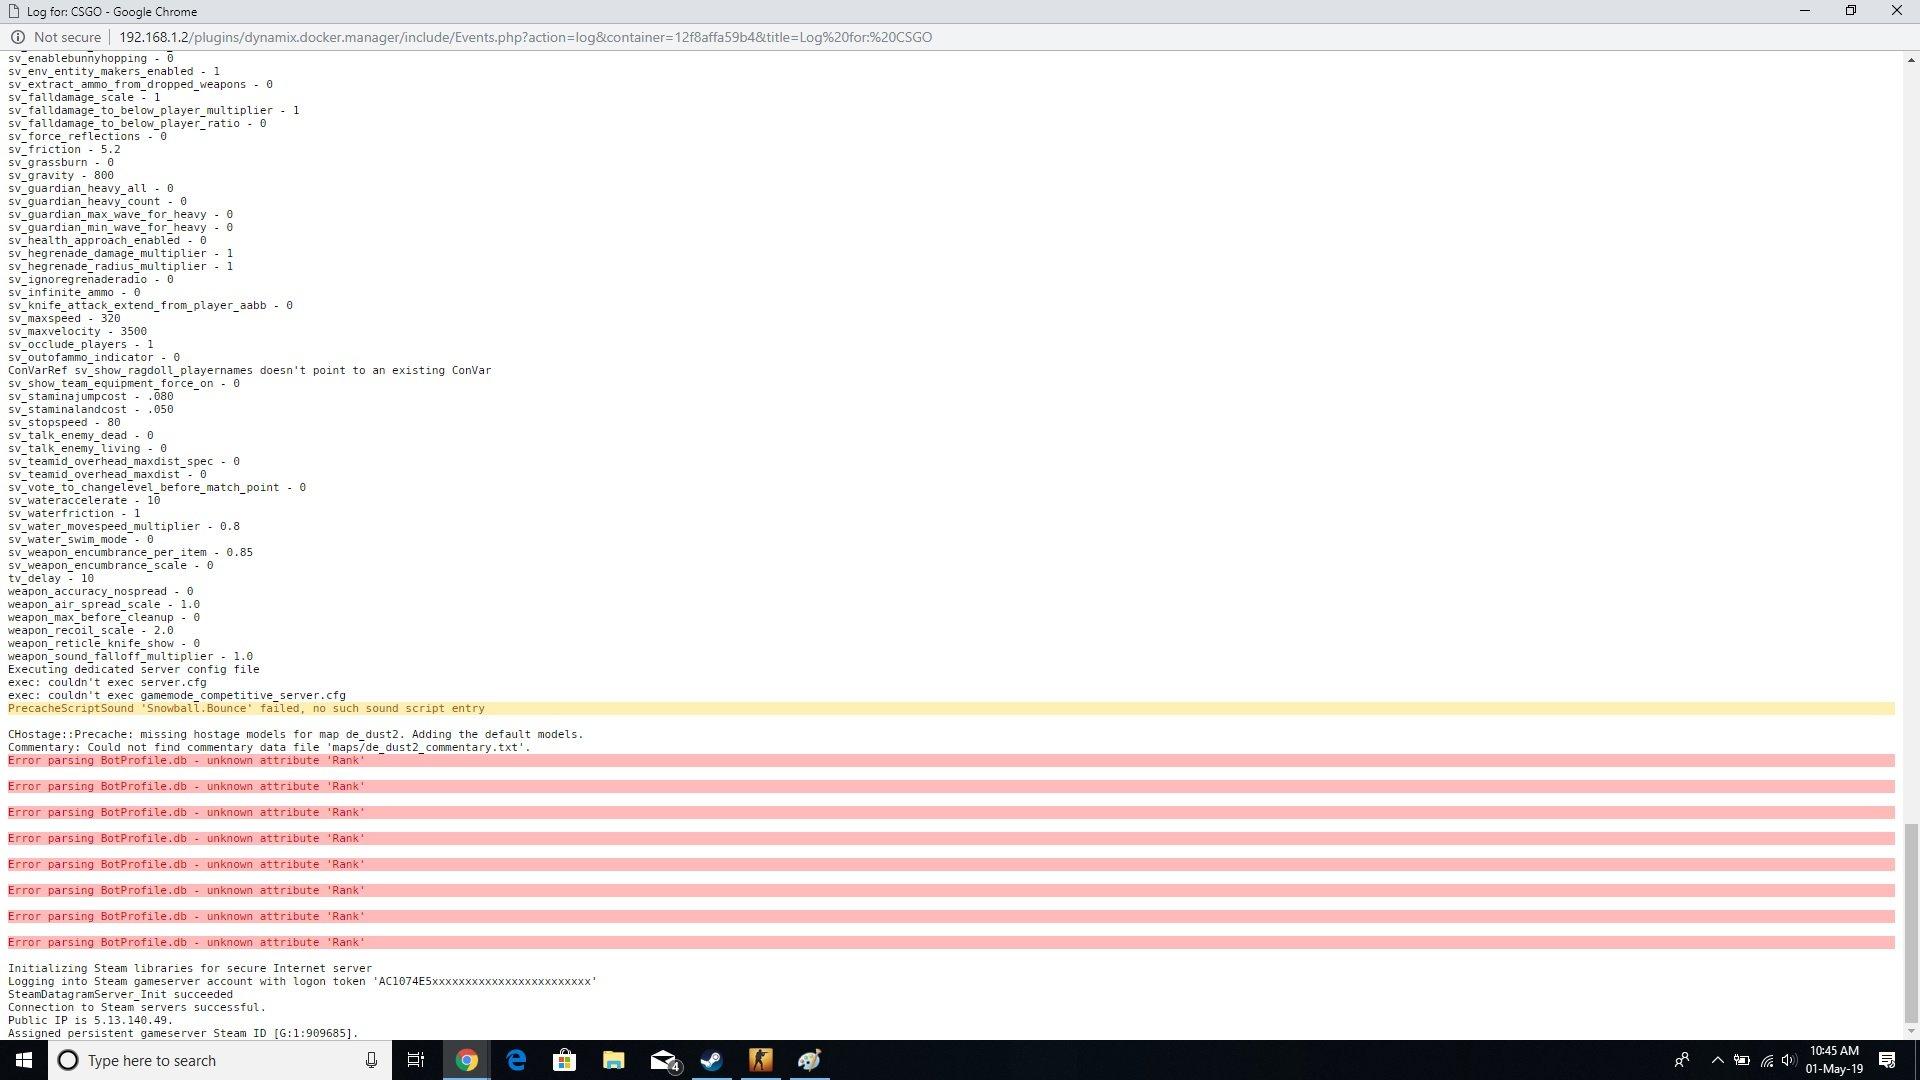 Support] ich777 - Gameserver Dockers - Page 2 - Docker